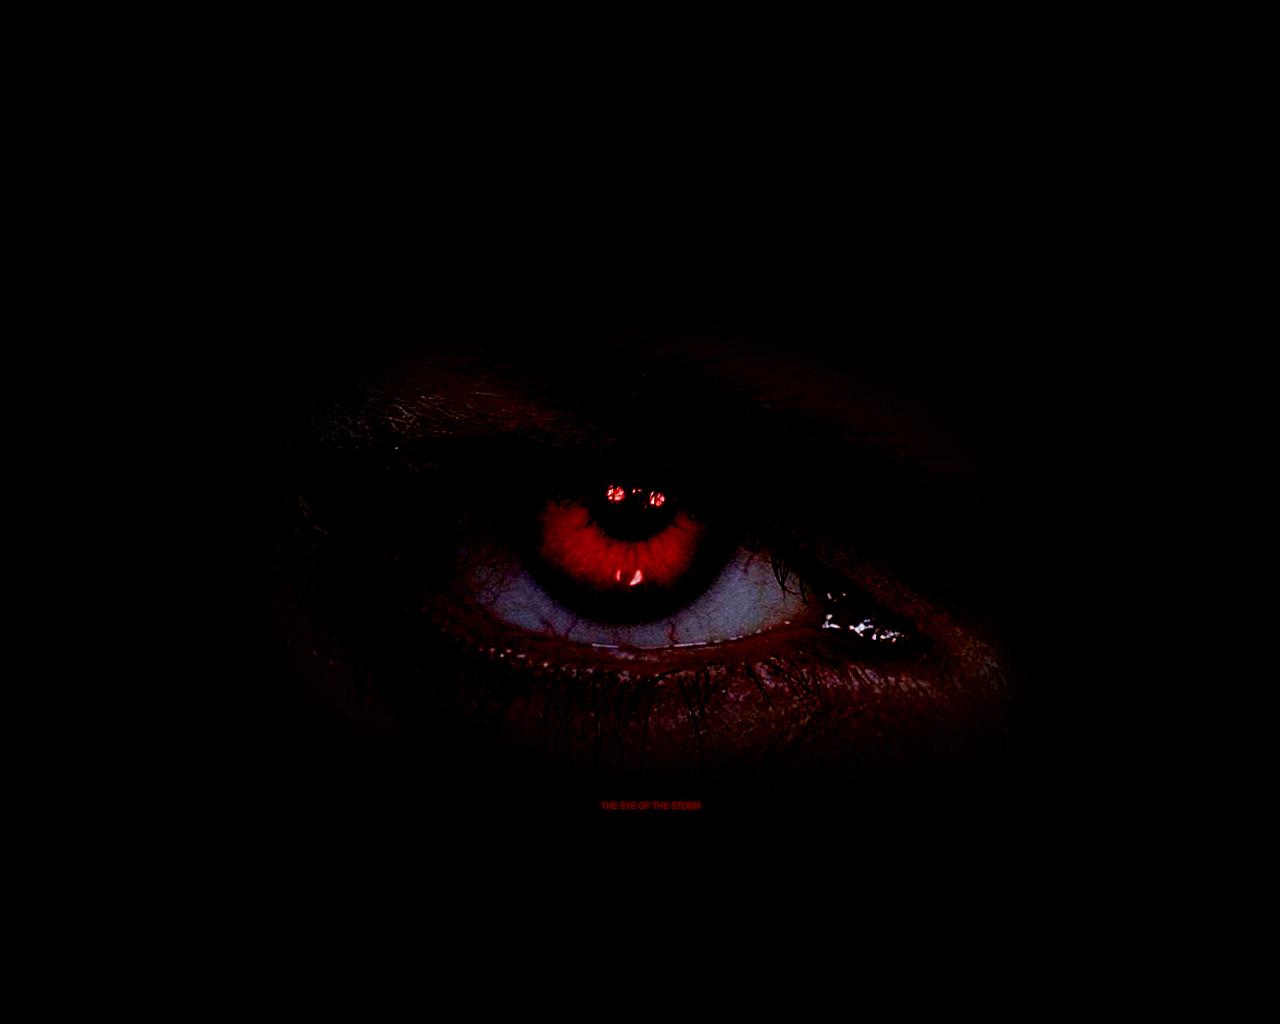 eyes evil dark vampire wallpaper - photo #6